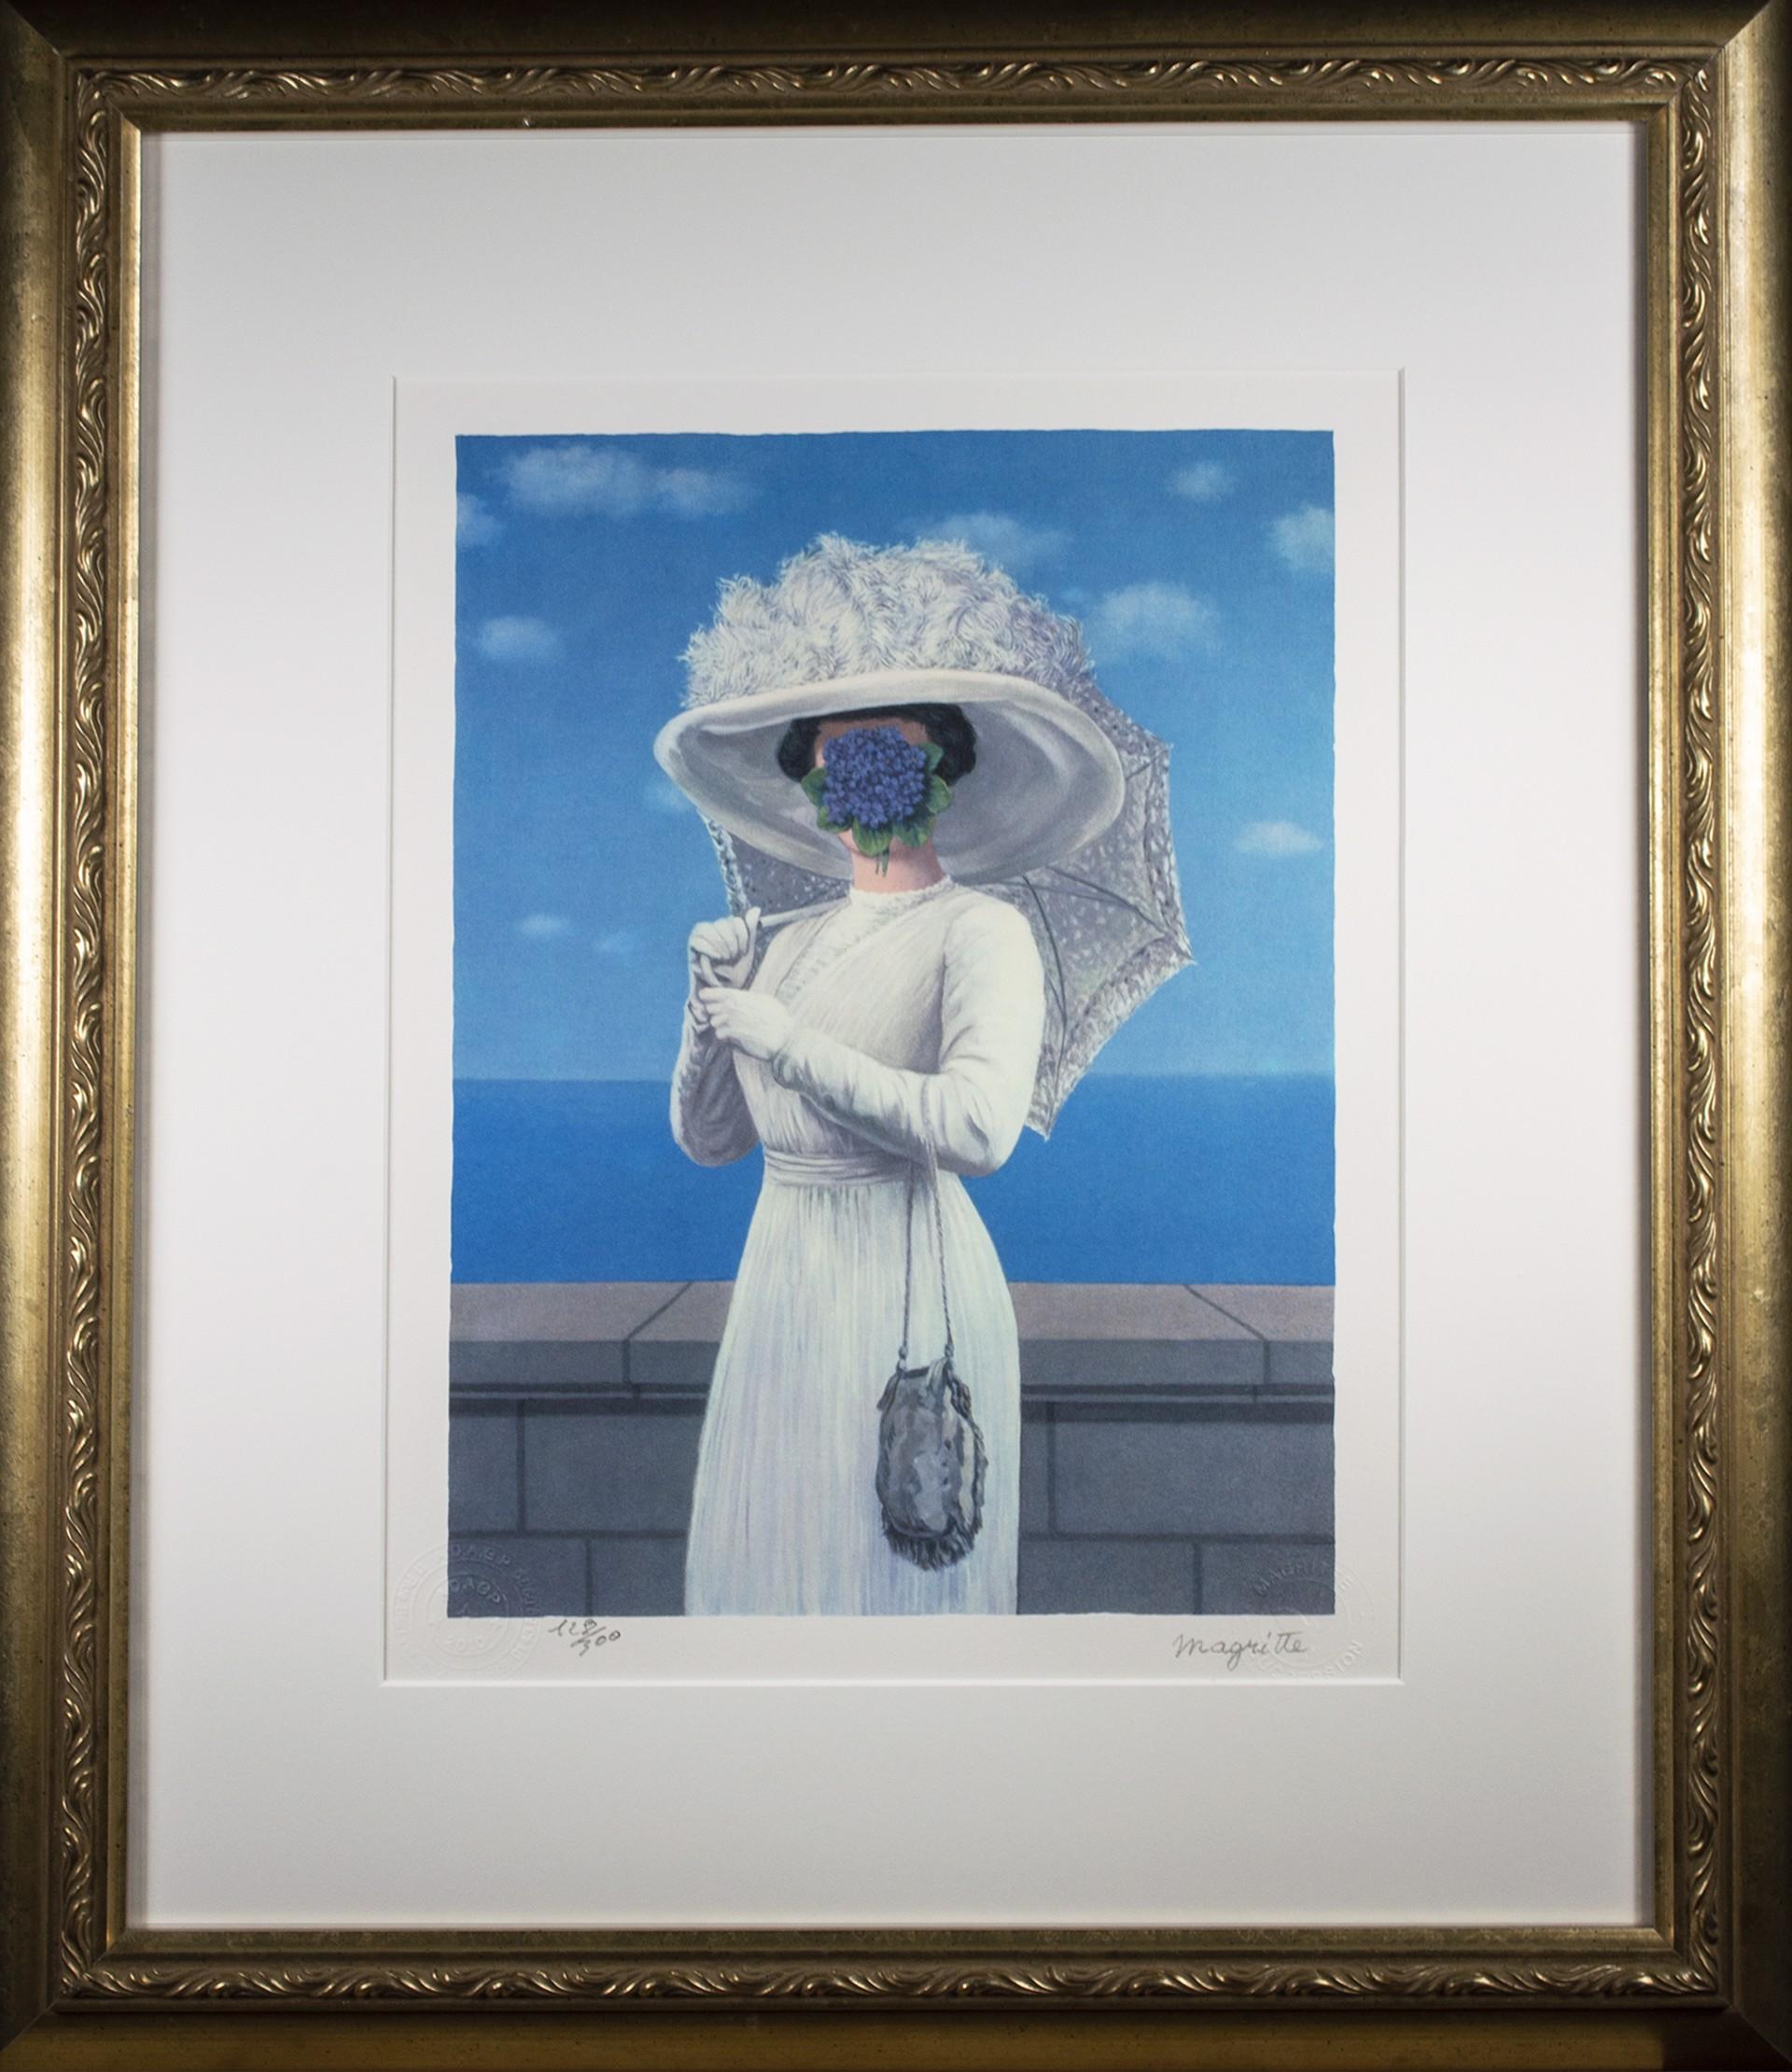 La Grande Guerre (The Great War) by Rene Magritte